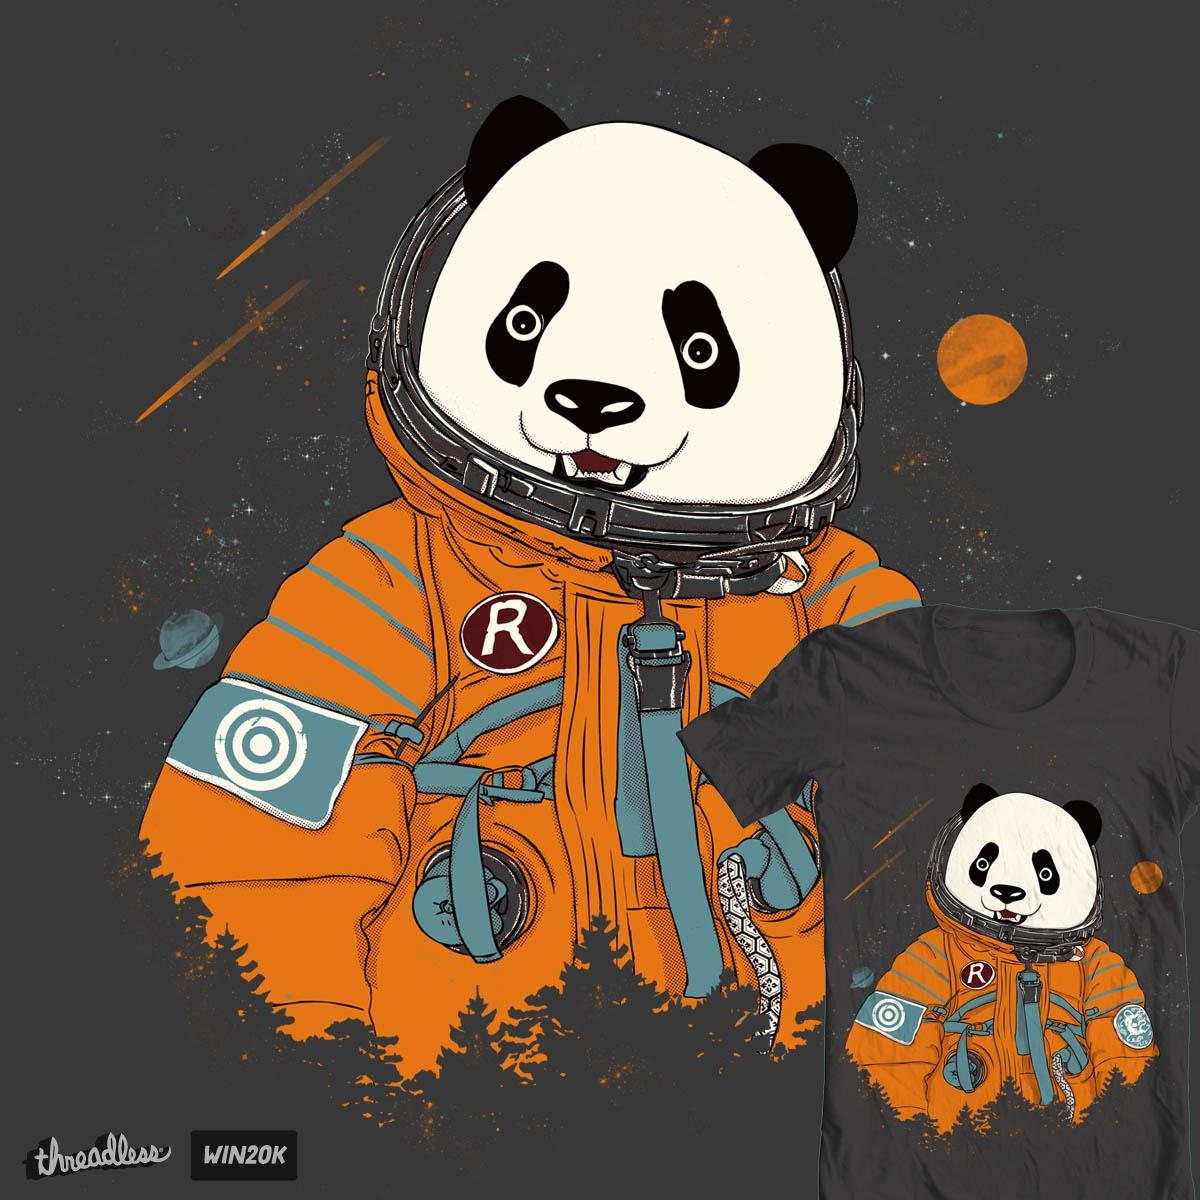 Pandastronaut by xiaobaosg on Threadless